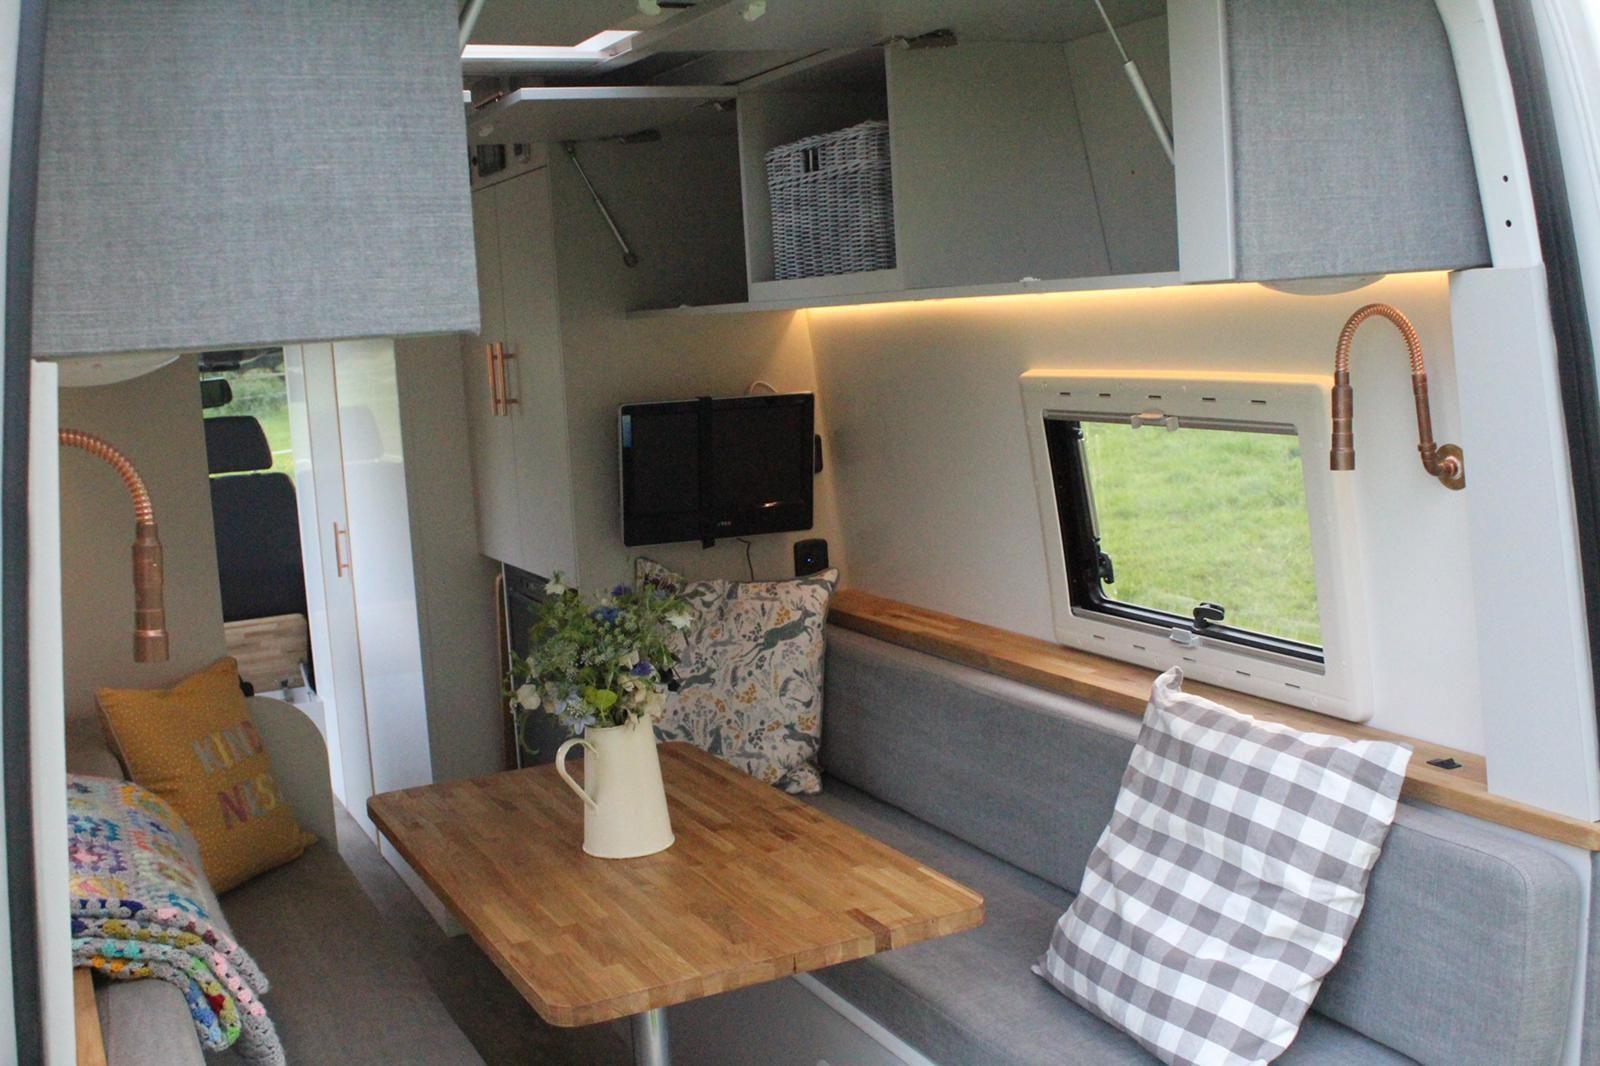 Olive Campervan interior, Interior, Campervan